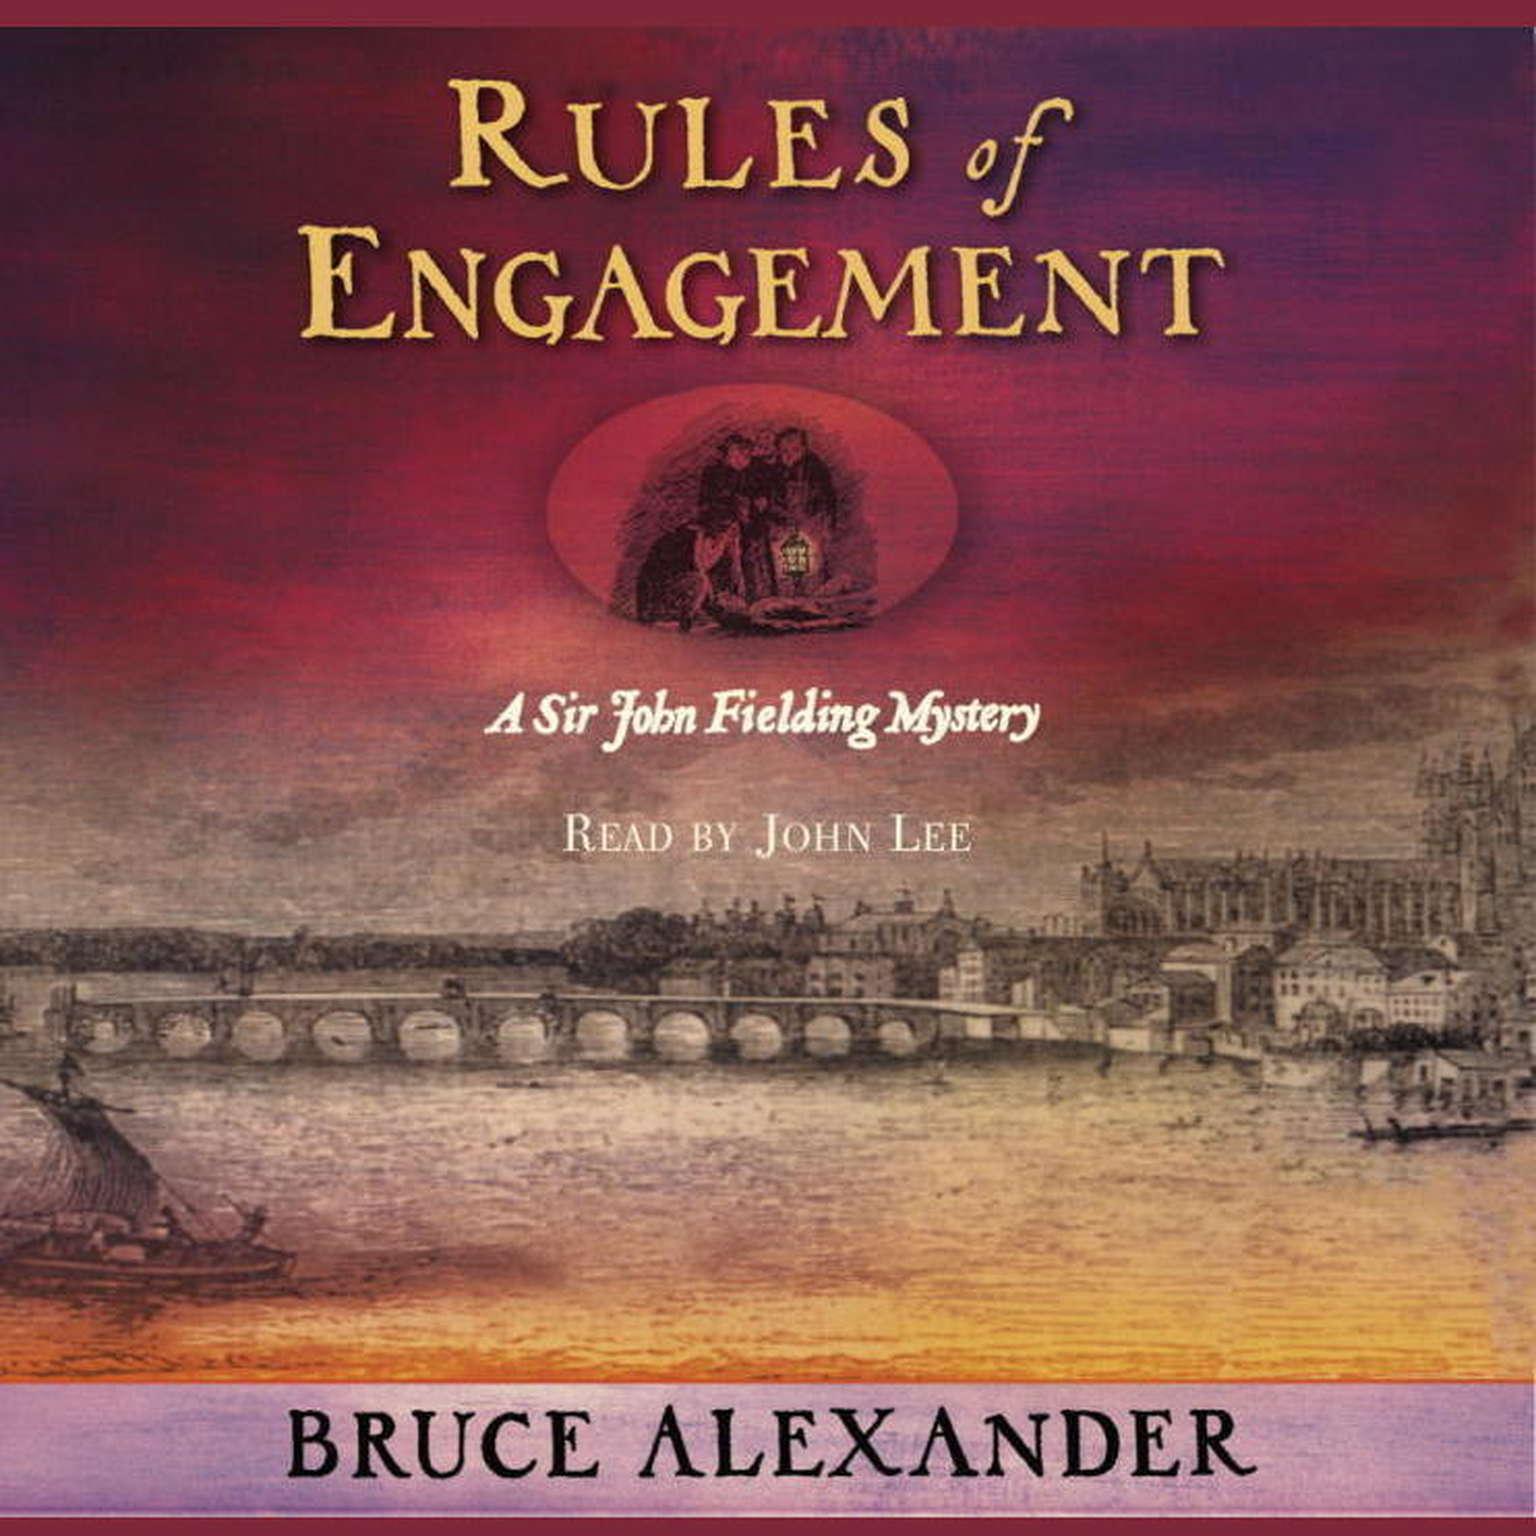 aladdin 3 wishes rules of engagement season